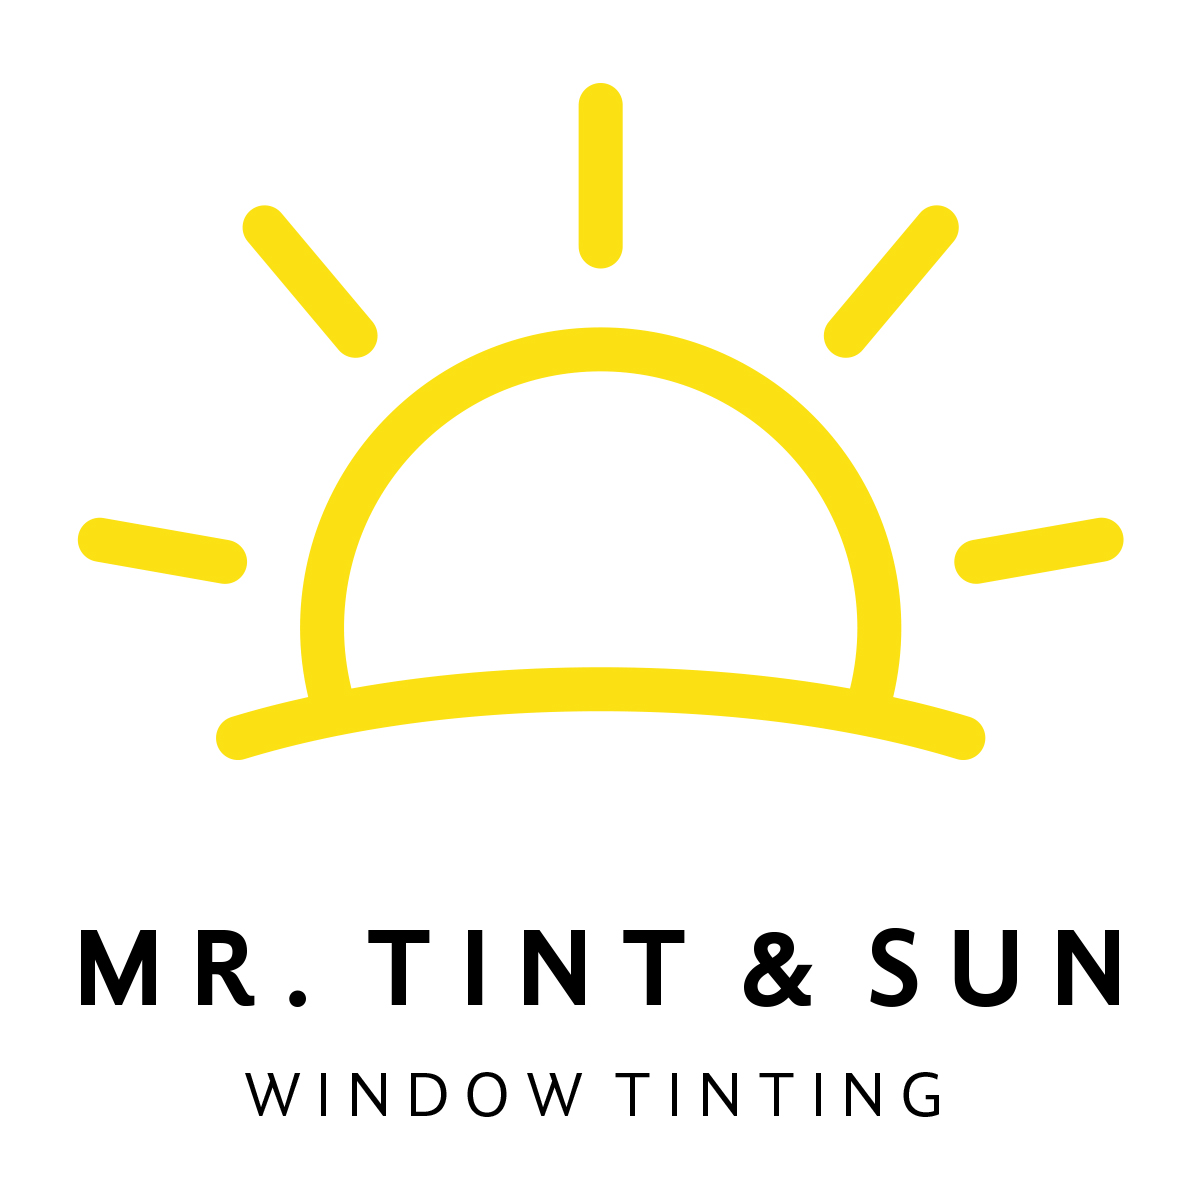 MR TINT AND SUN WINDOW TINTING PHUKET - LOGO